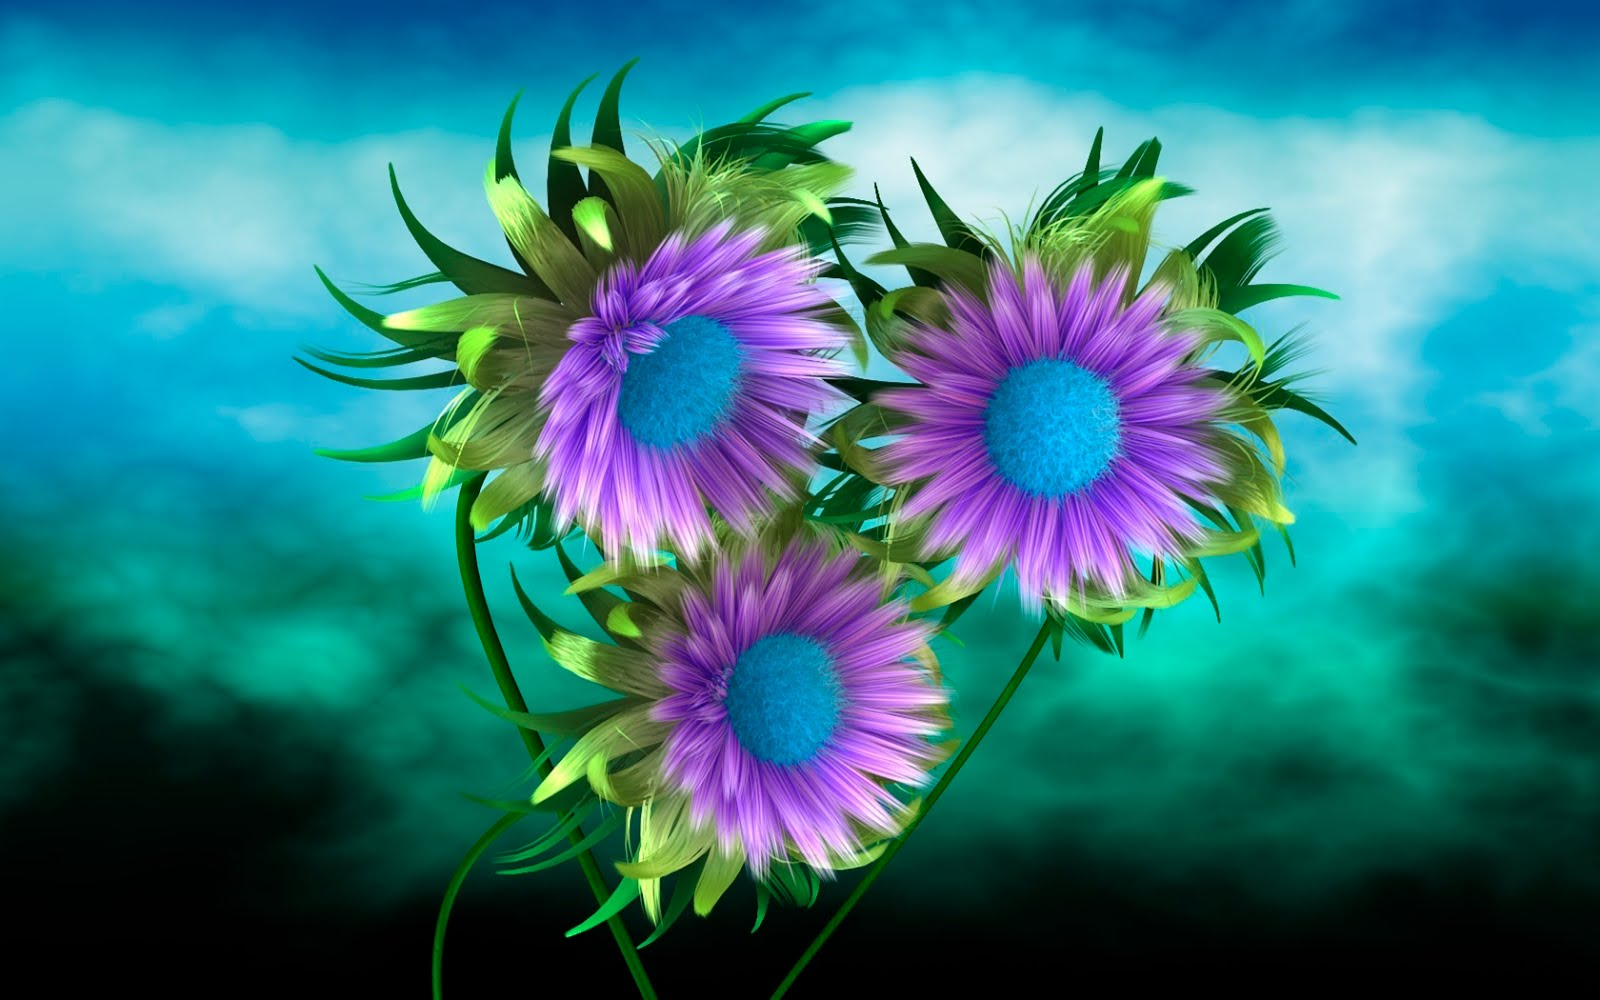 Lindas Flores Azules Como El Cielo Wallpaper Hd Ultra